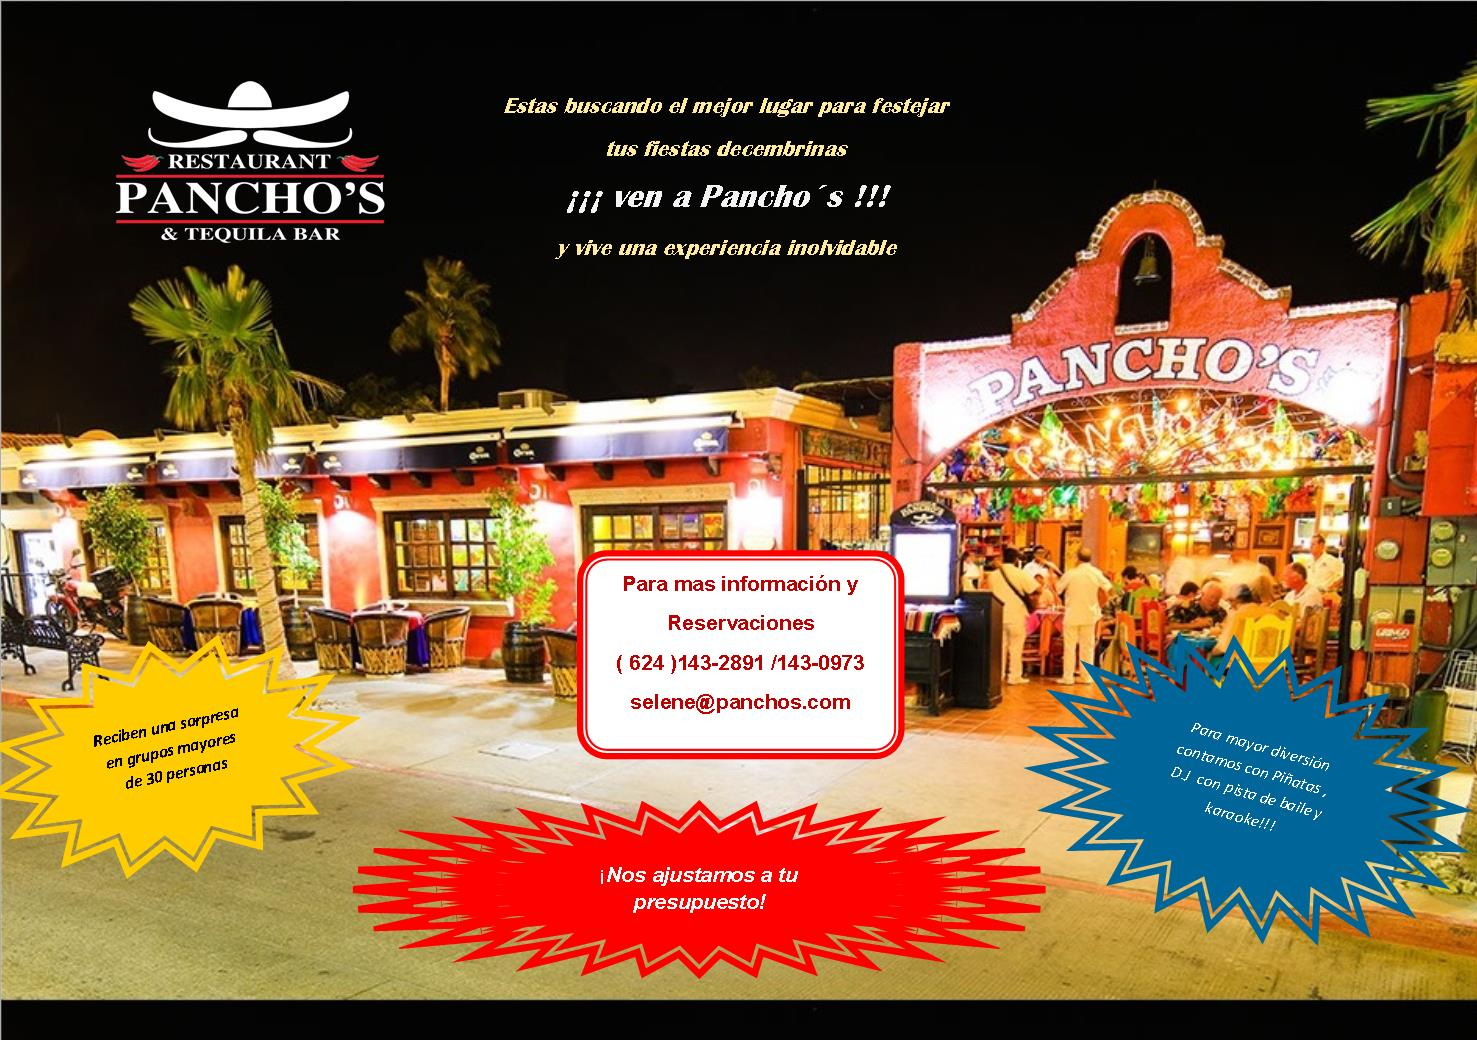 posadas-panchos-restaurant-2016